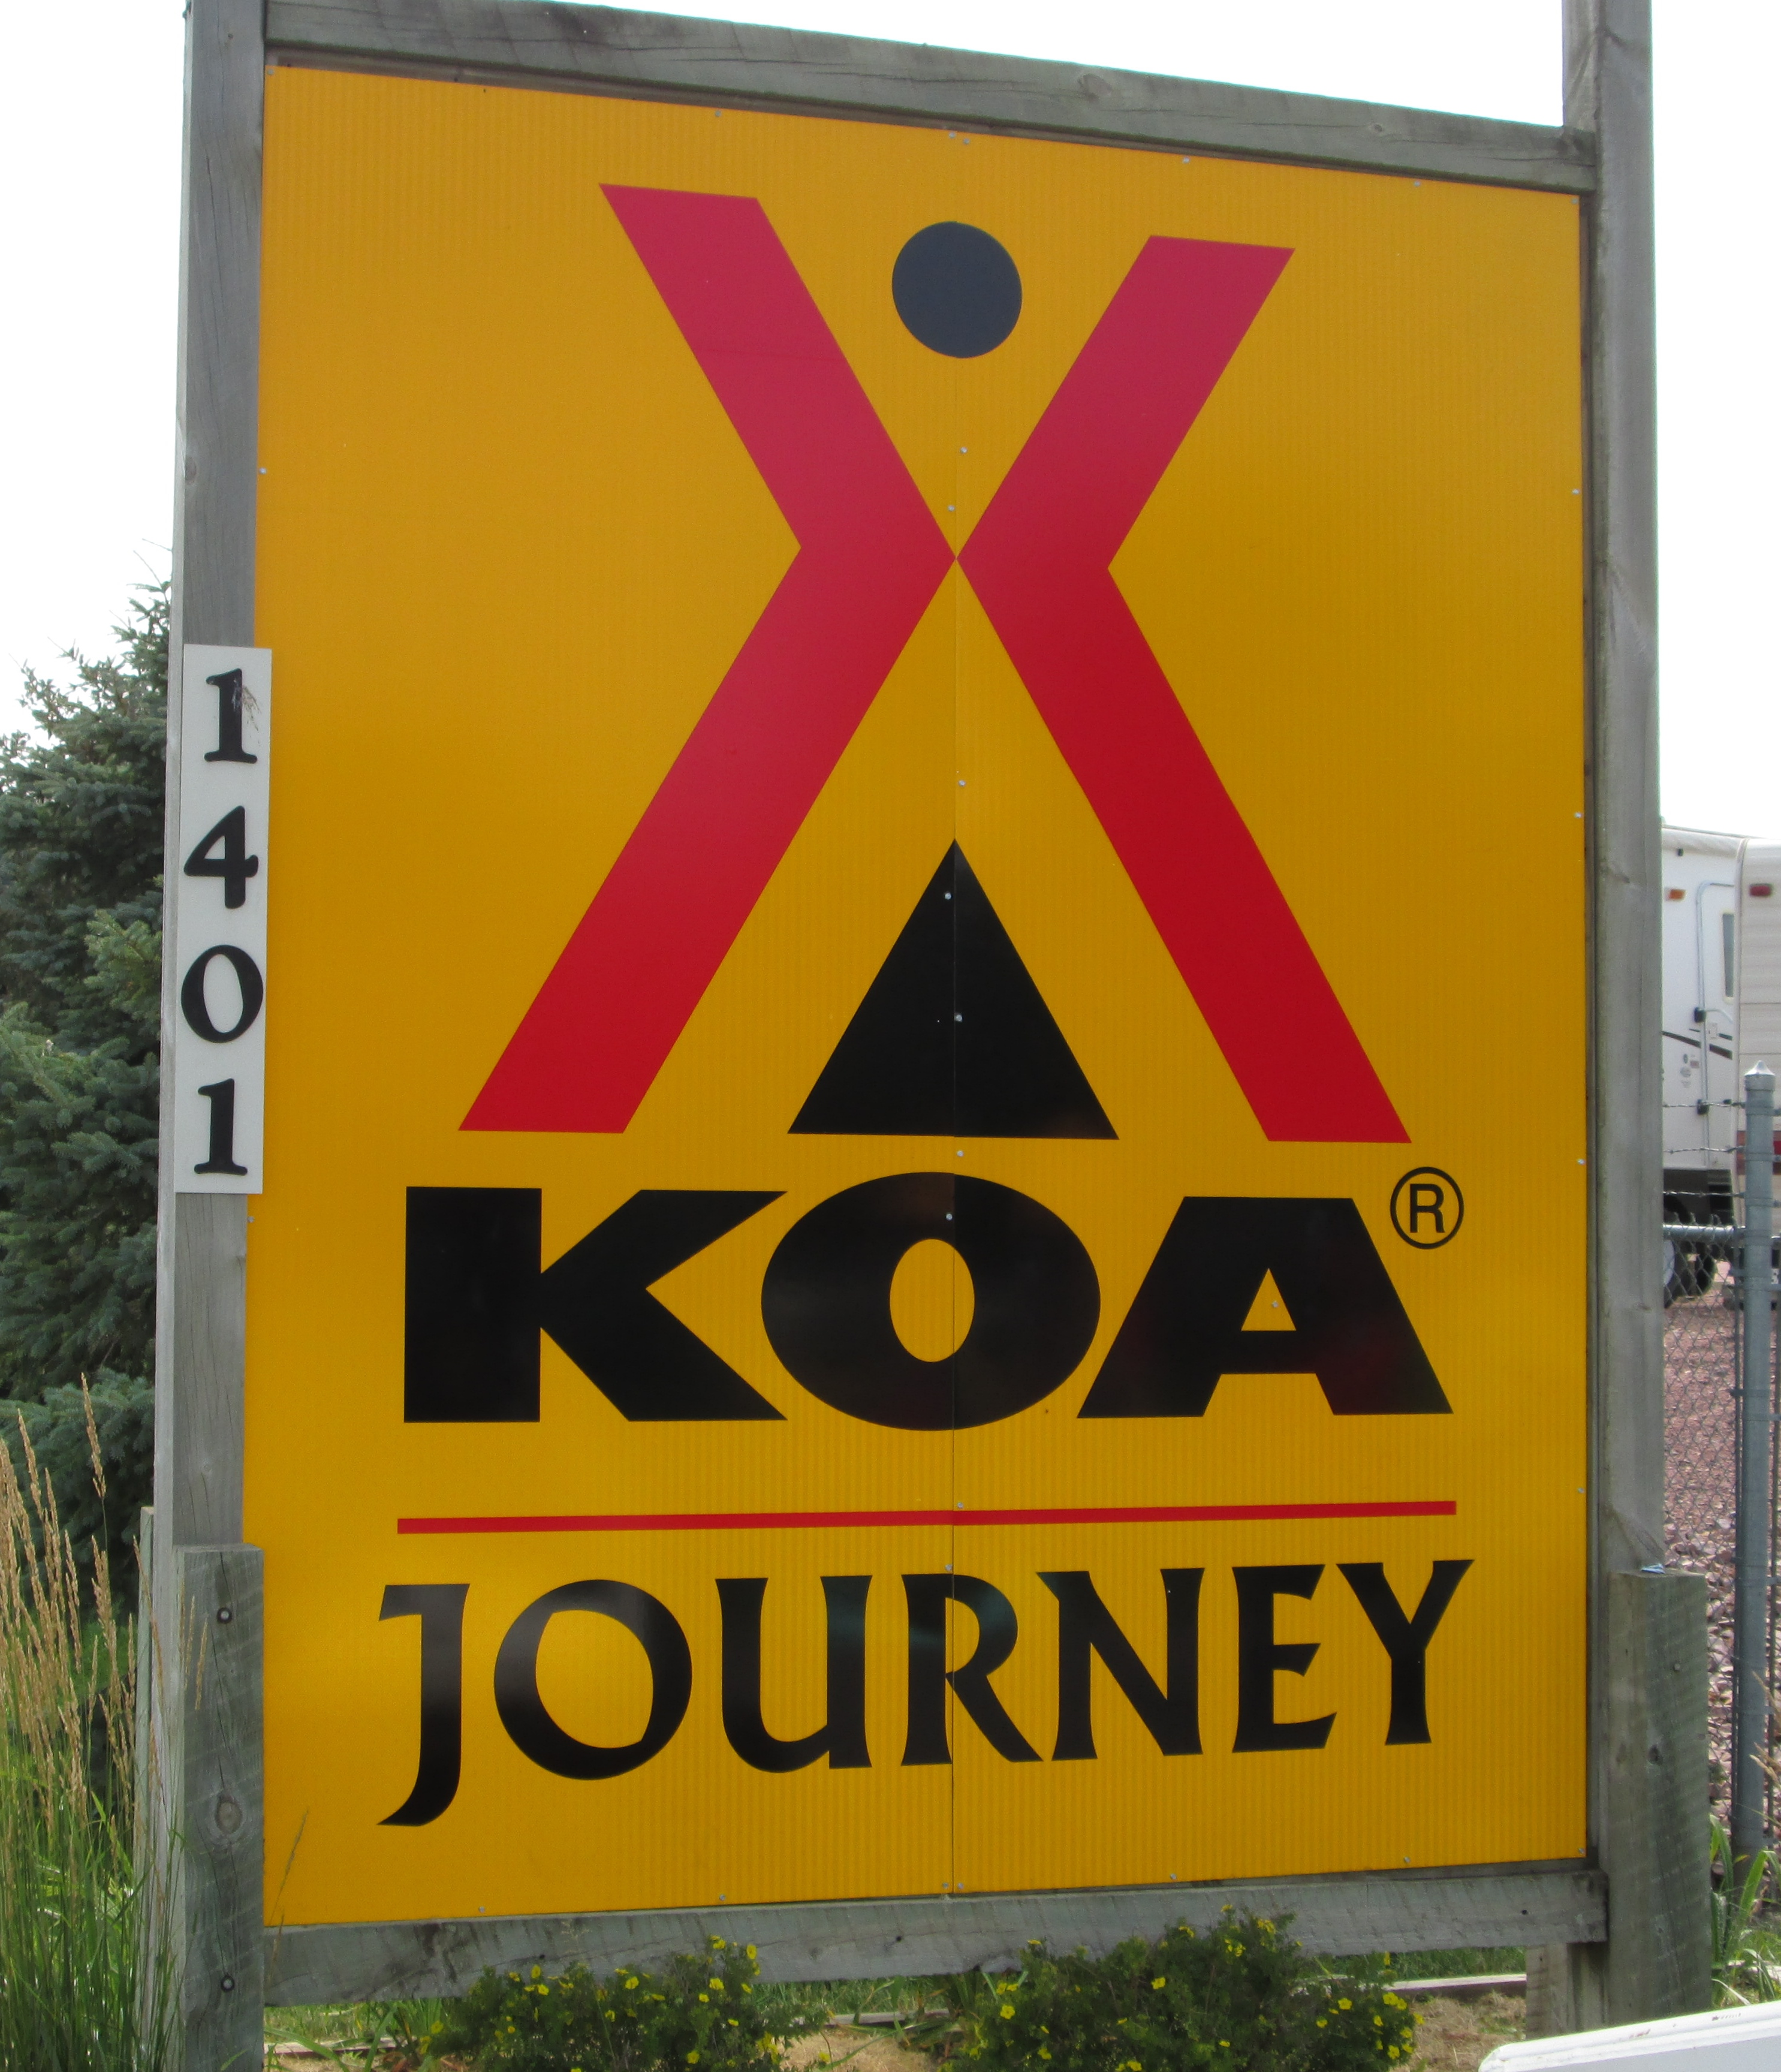 Sioux Falls KOA Journey image 20